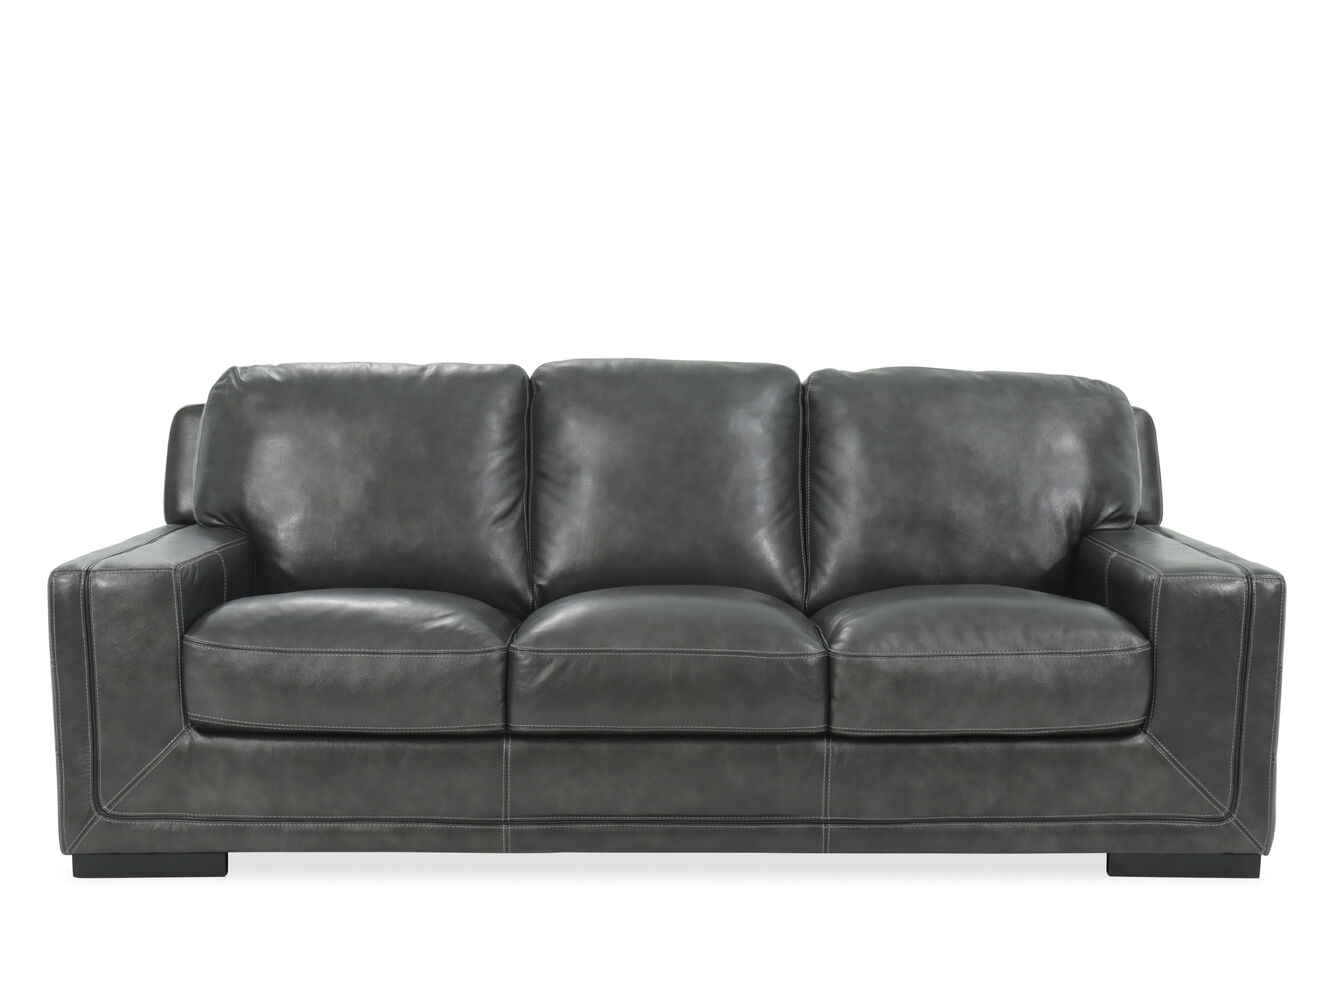 Simon li las vegas pewter leather sofa mathis brothers furniture living room